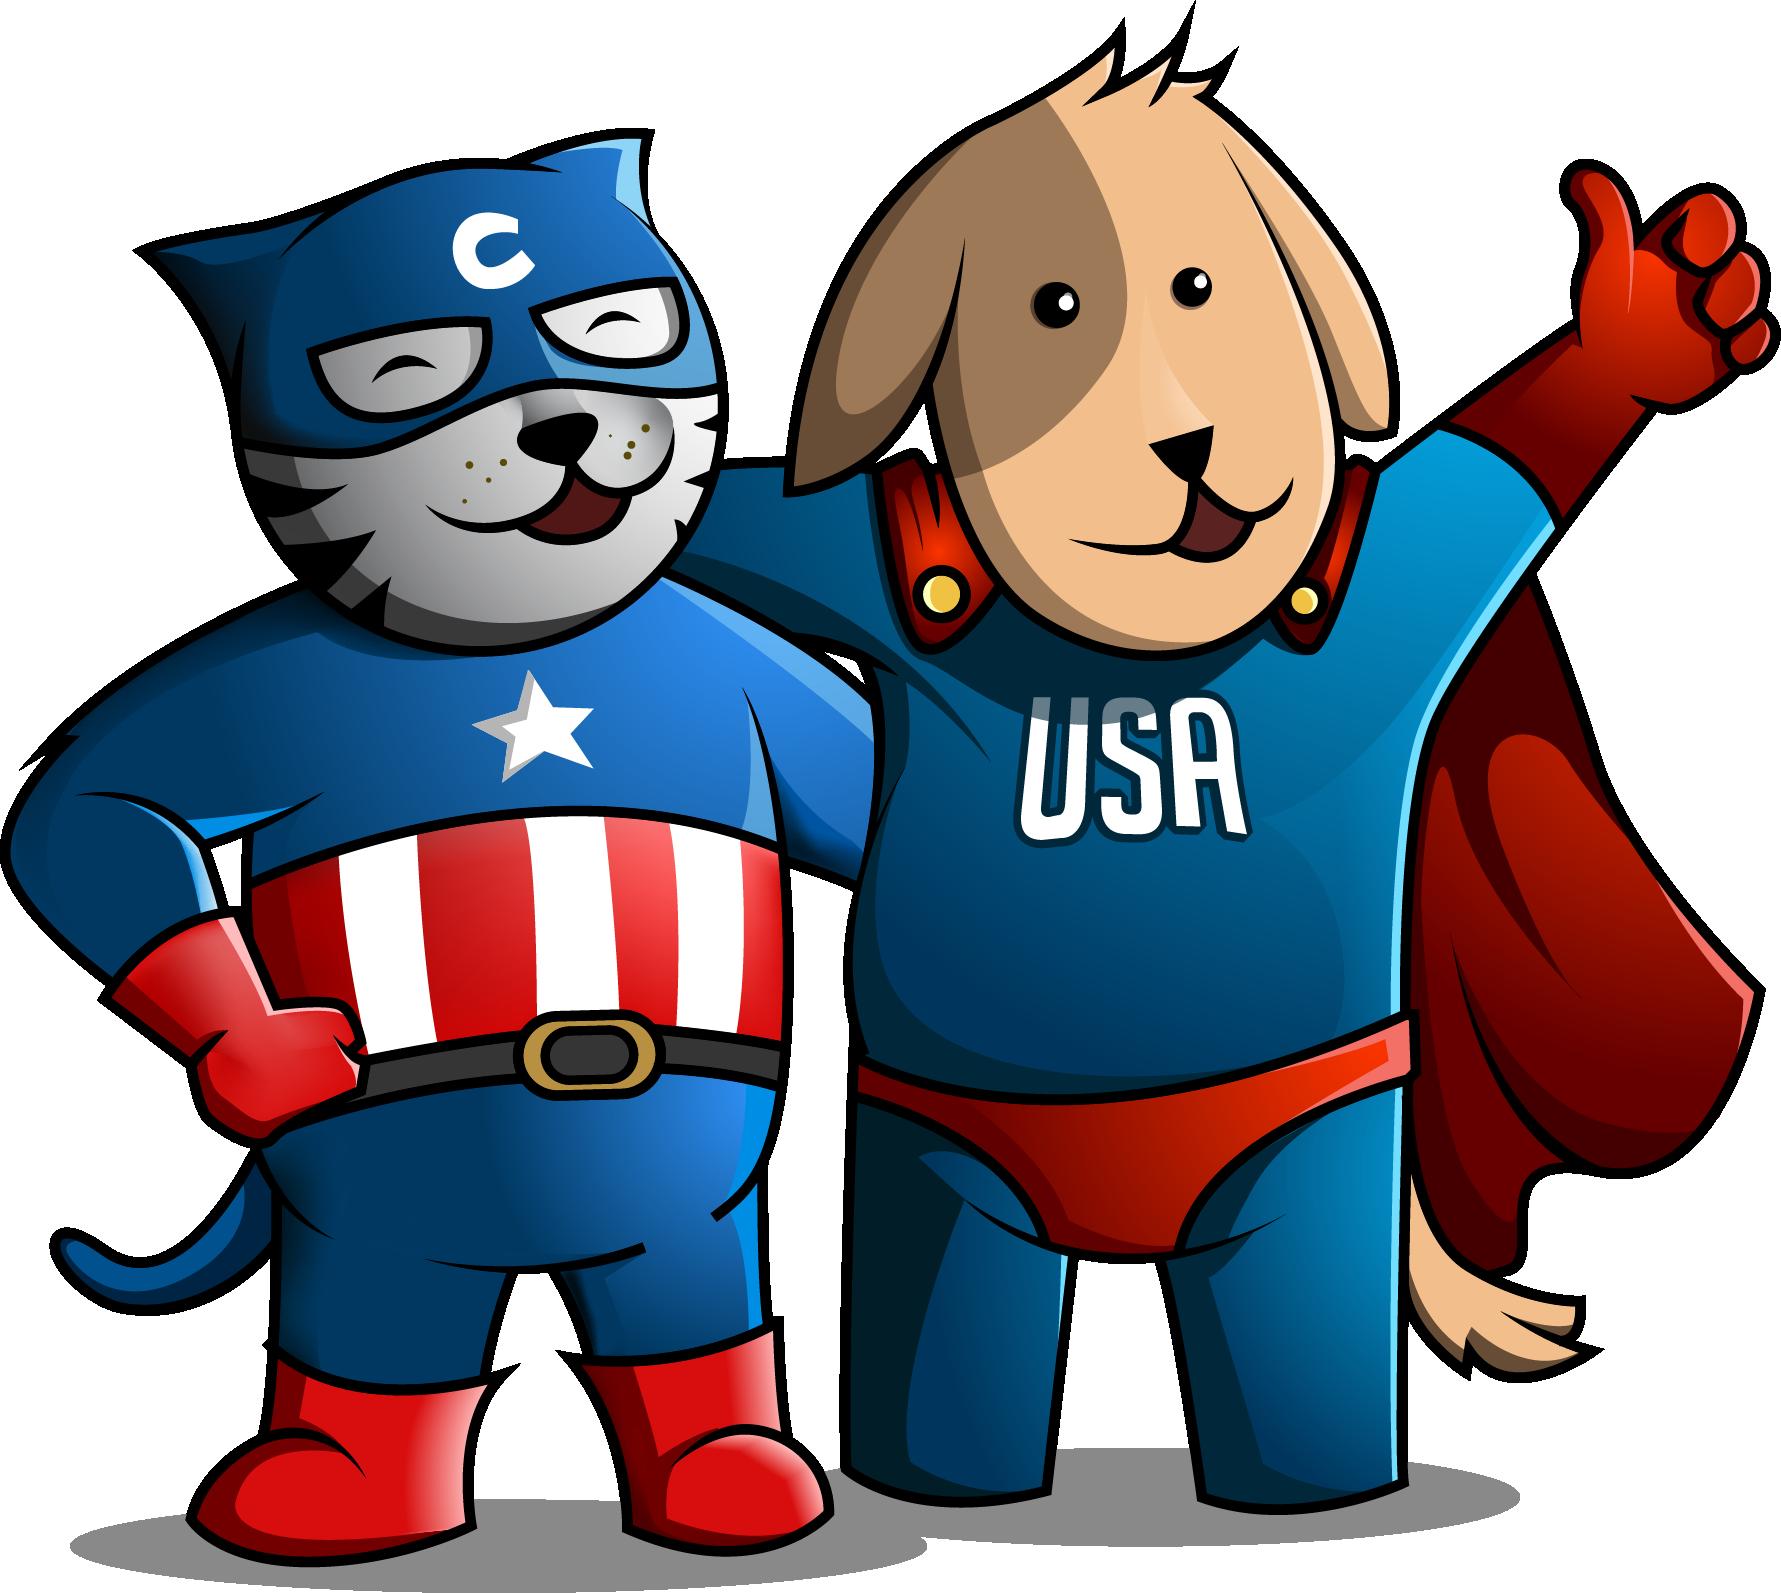 Create a feel good image for a pet supplies retailer.